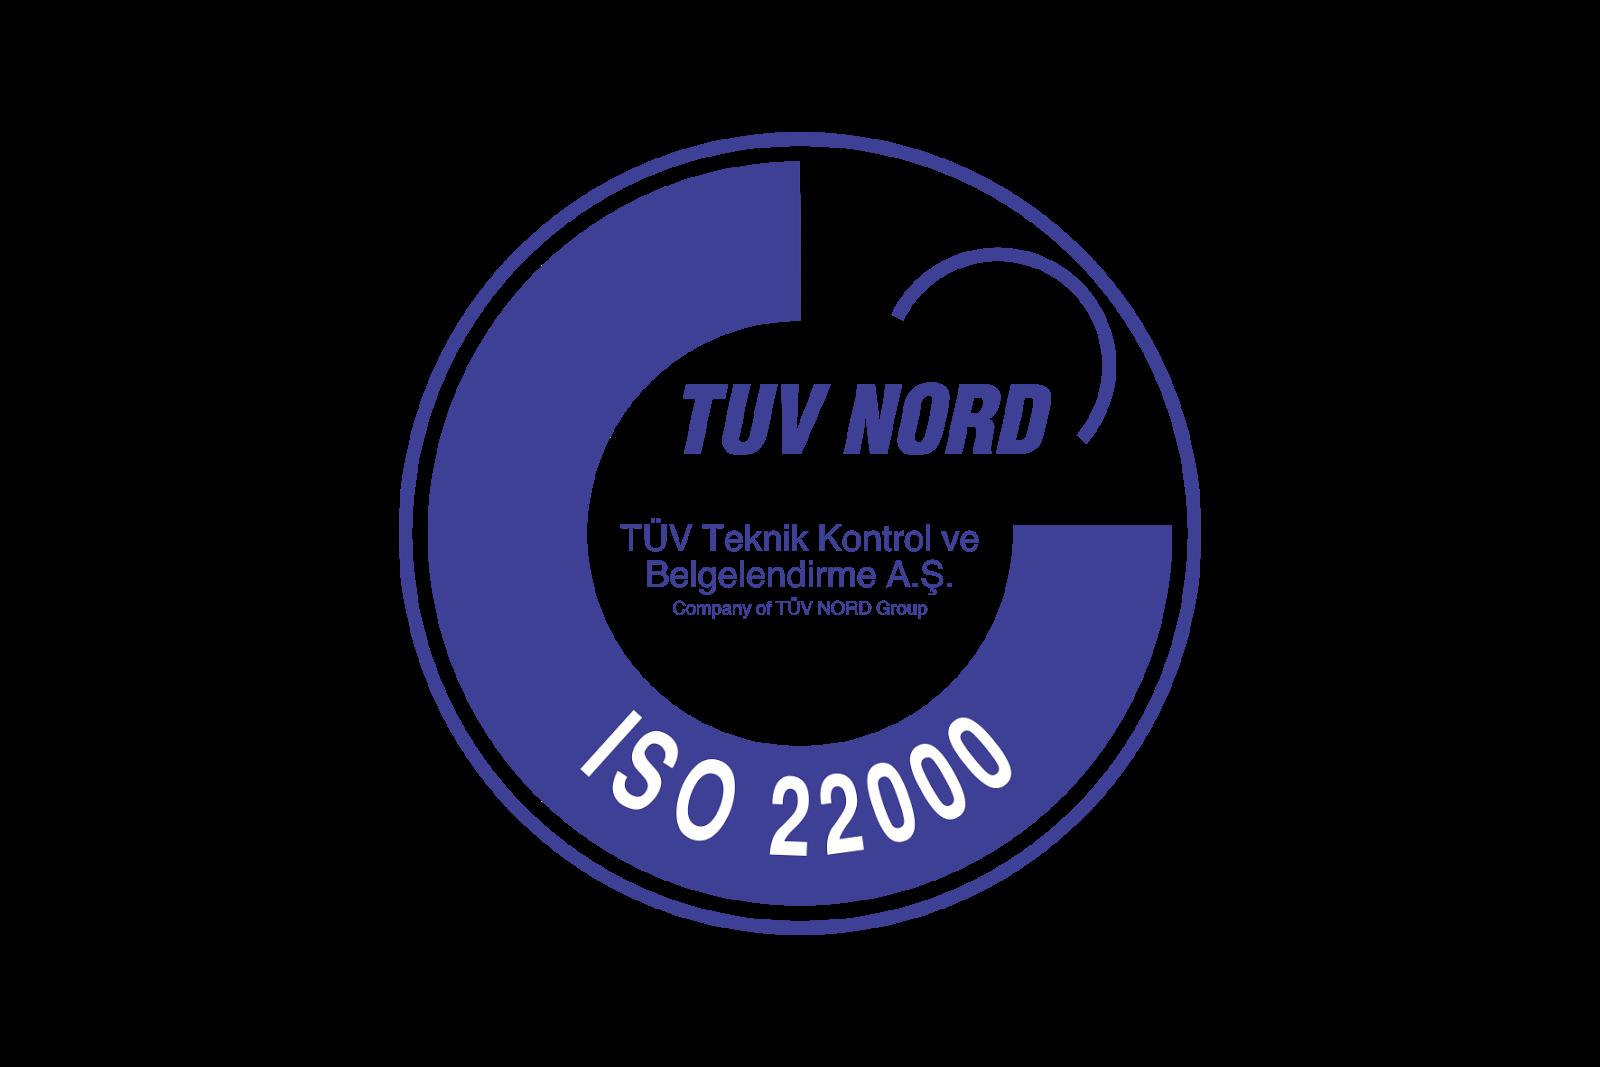 TUV Nord ISO 22000 Logo